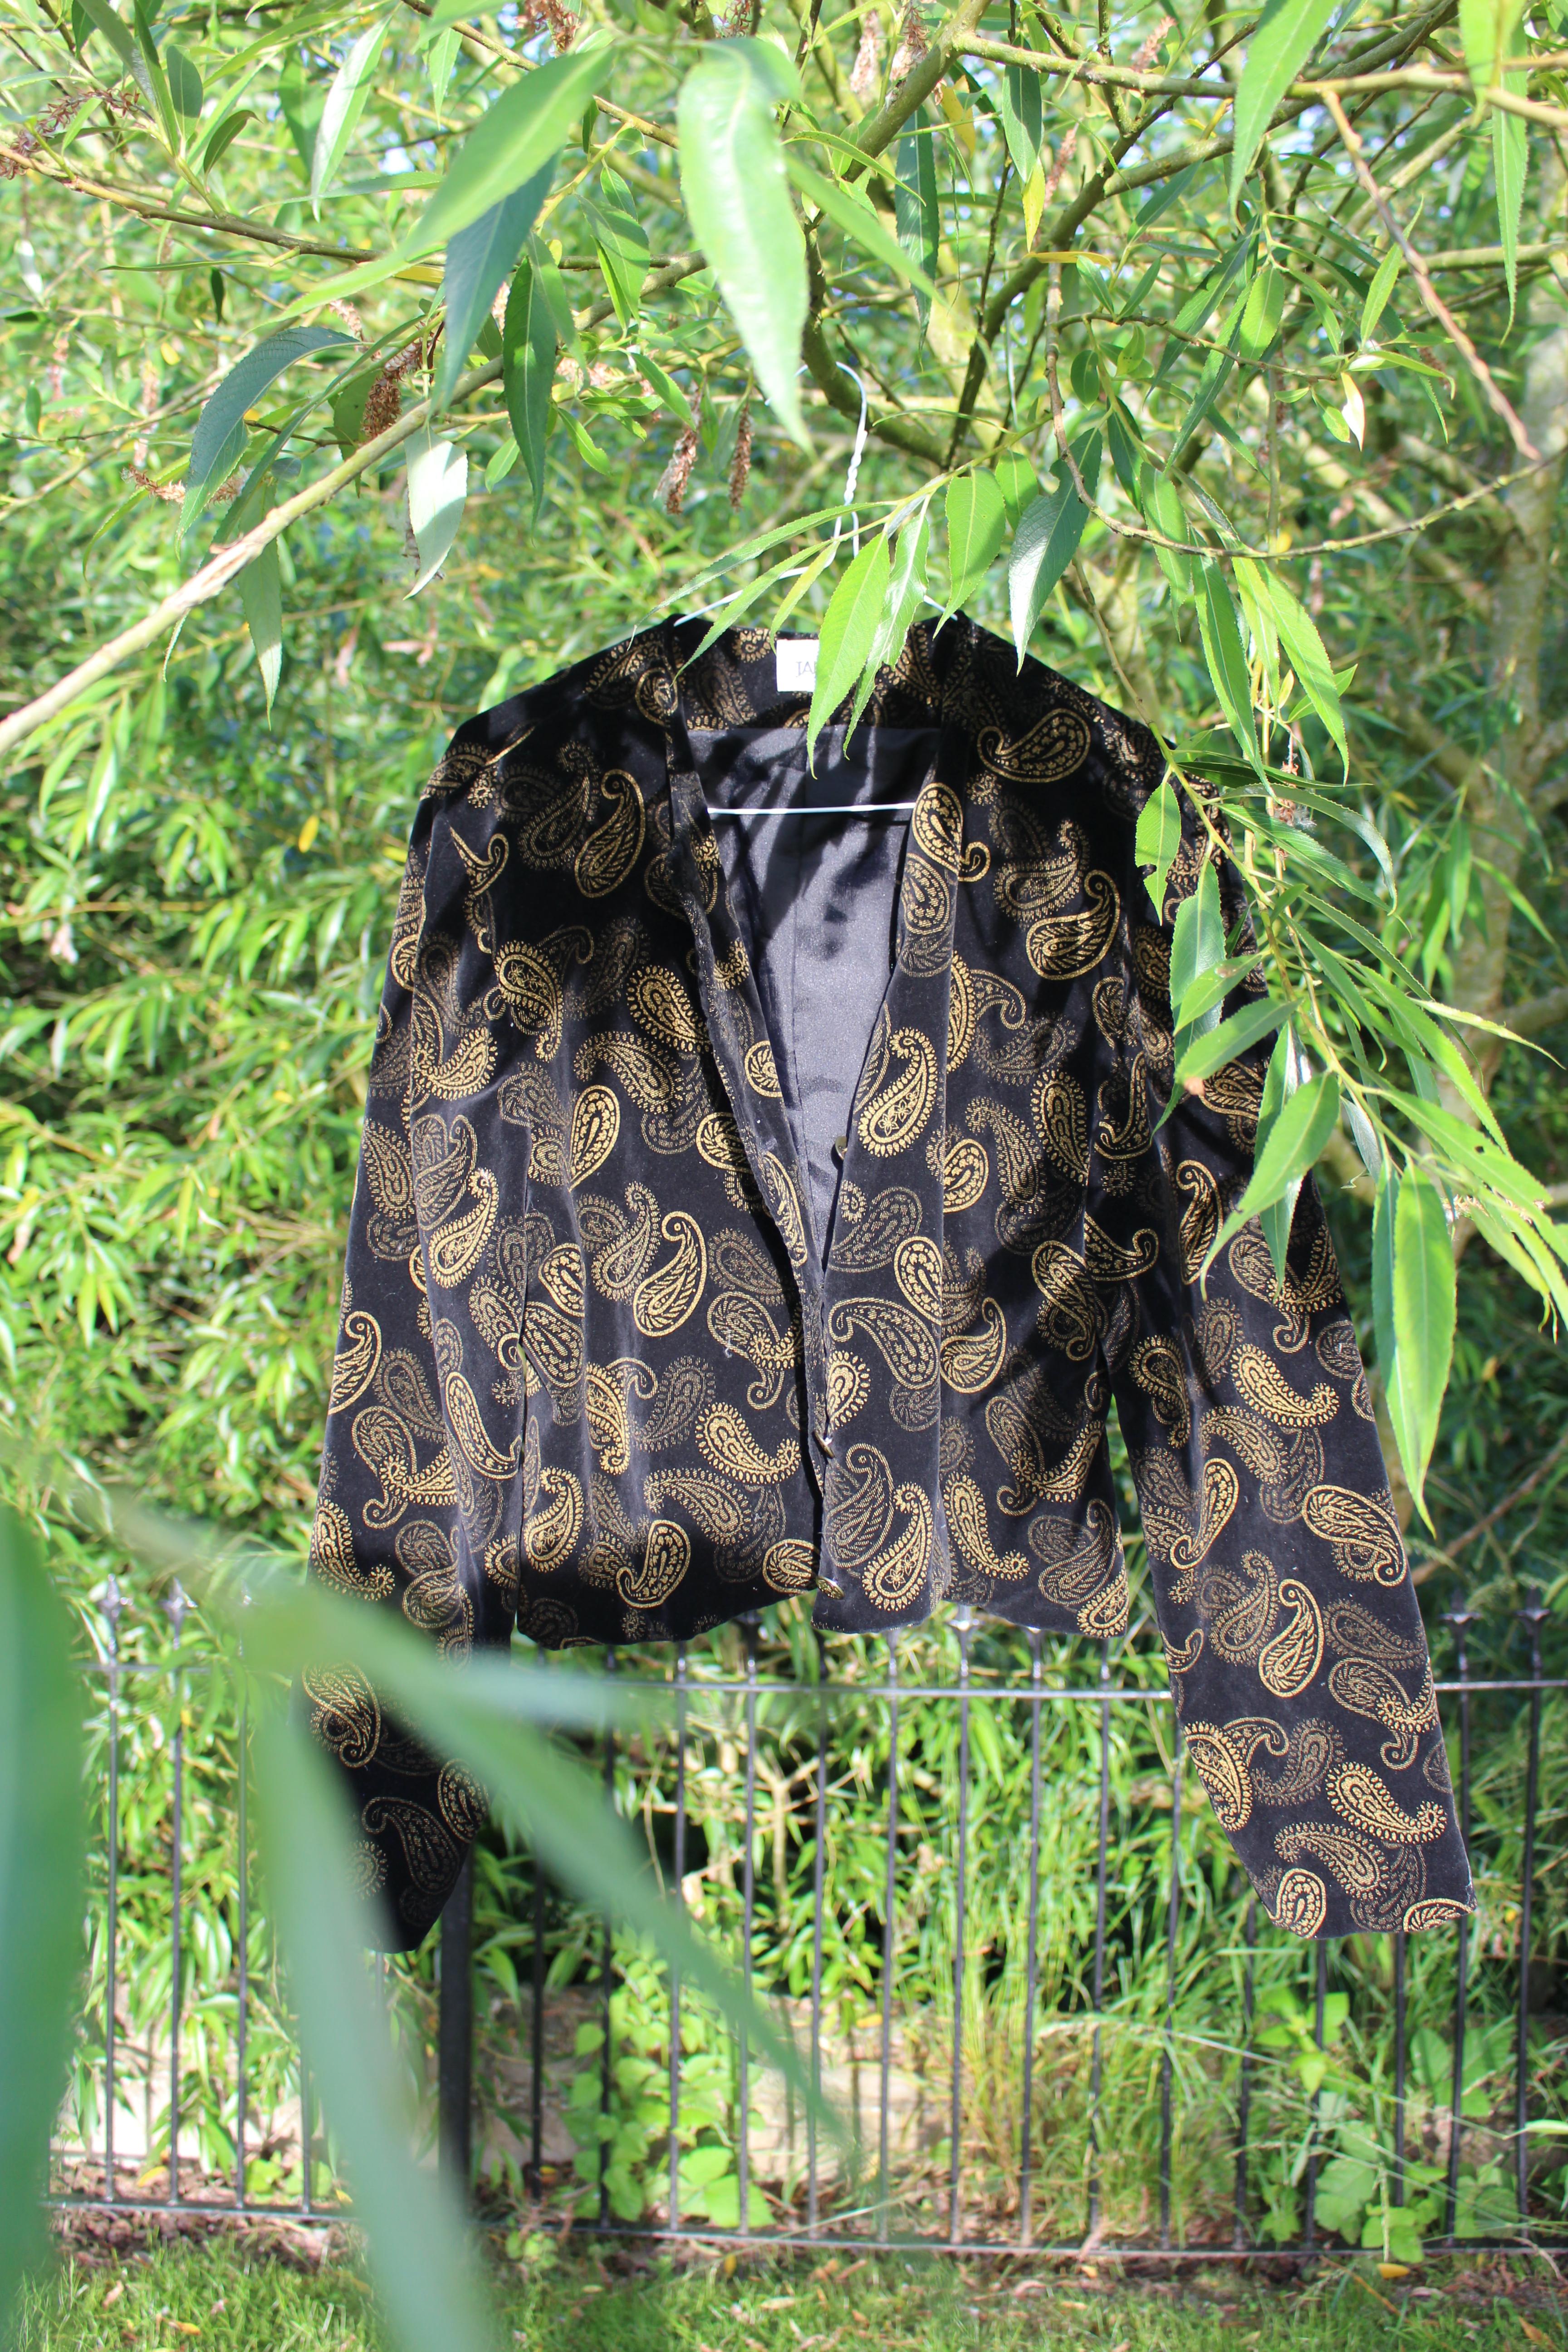 Jake cropped velvet paisley jacket, from Unicorn, 5 Ship Street, Oxford